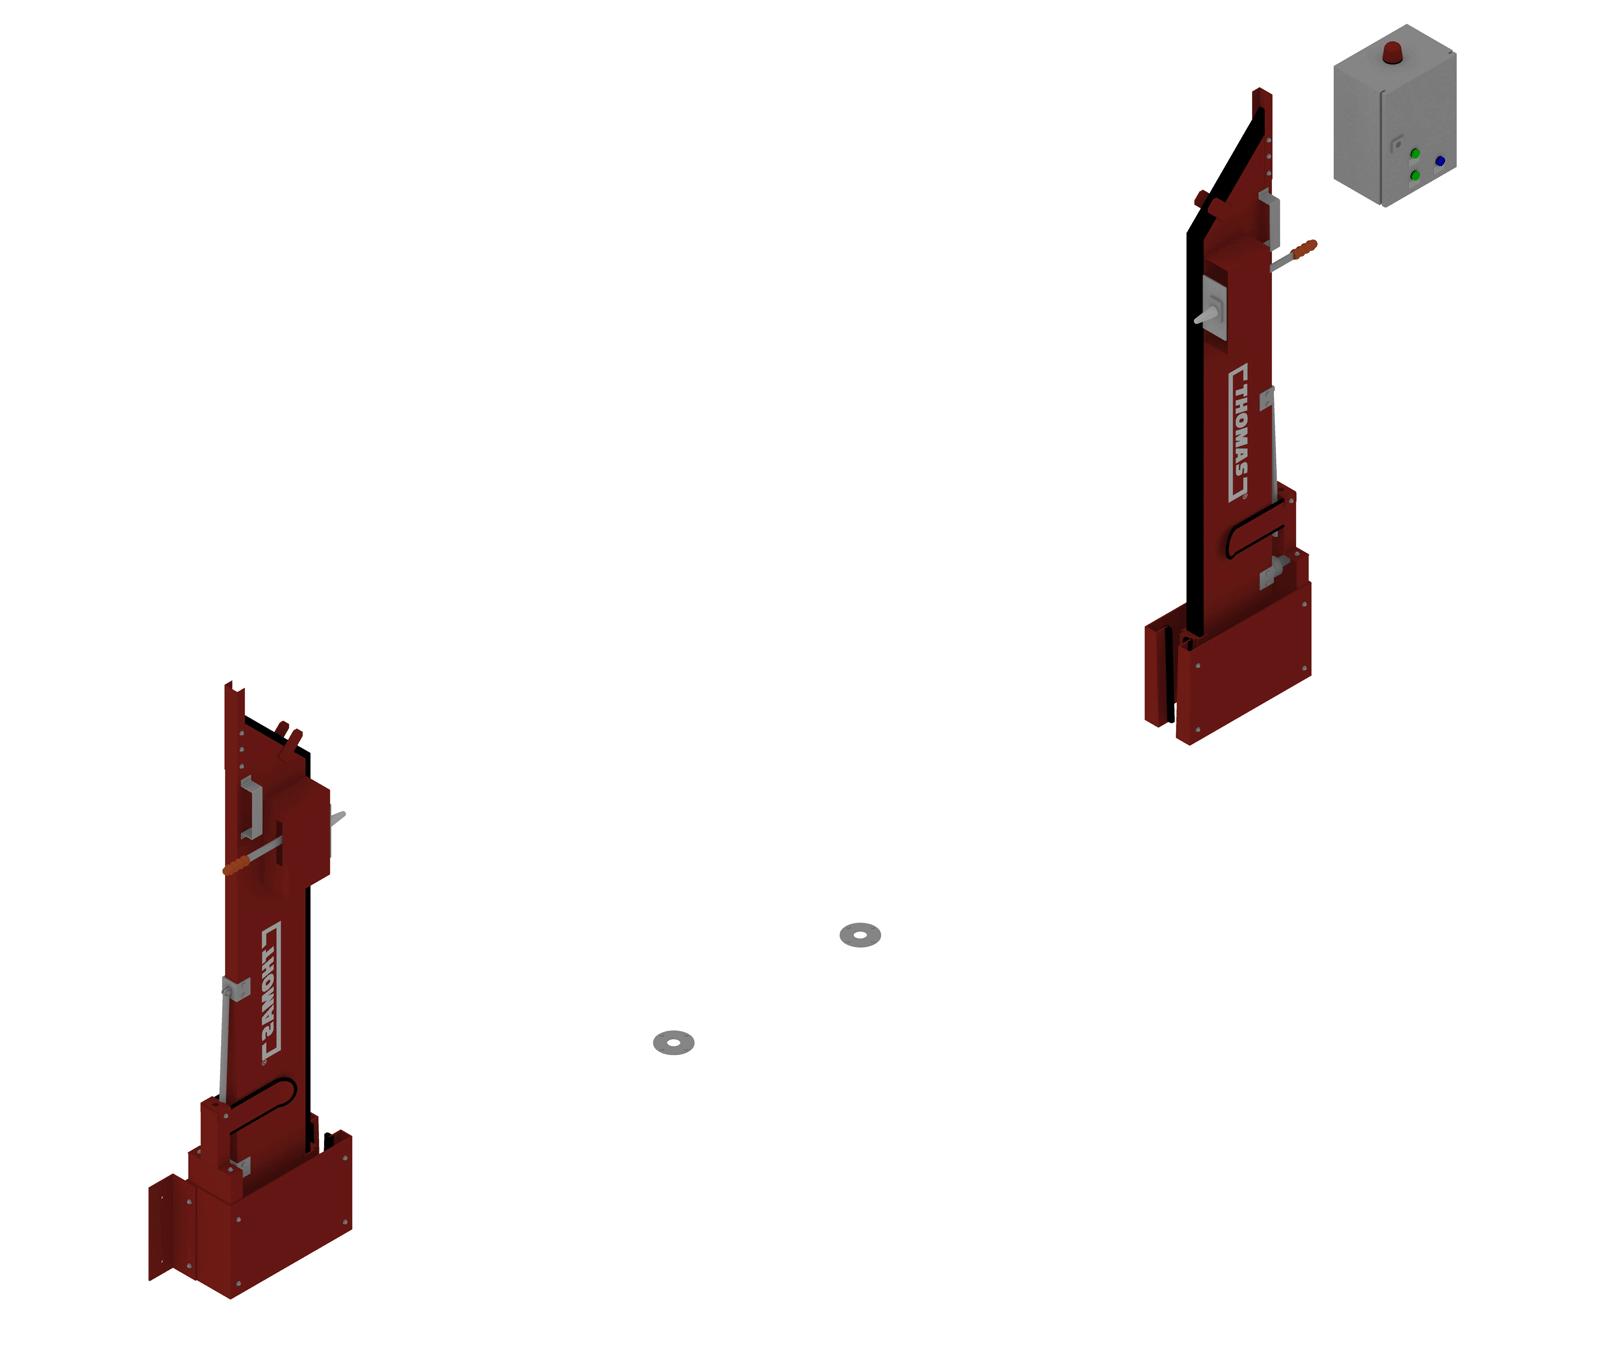 thomas-systech-automatische-barriere-beidseitig-vertikal-drehbar-manuelle-rueckstellung-offen-1600×1350